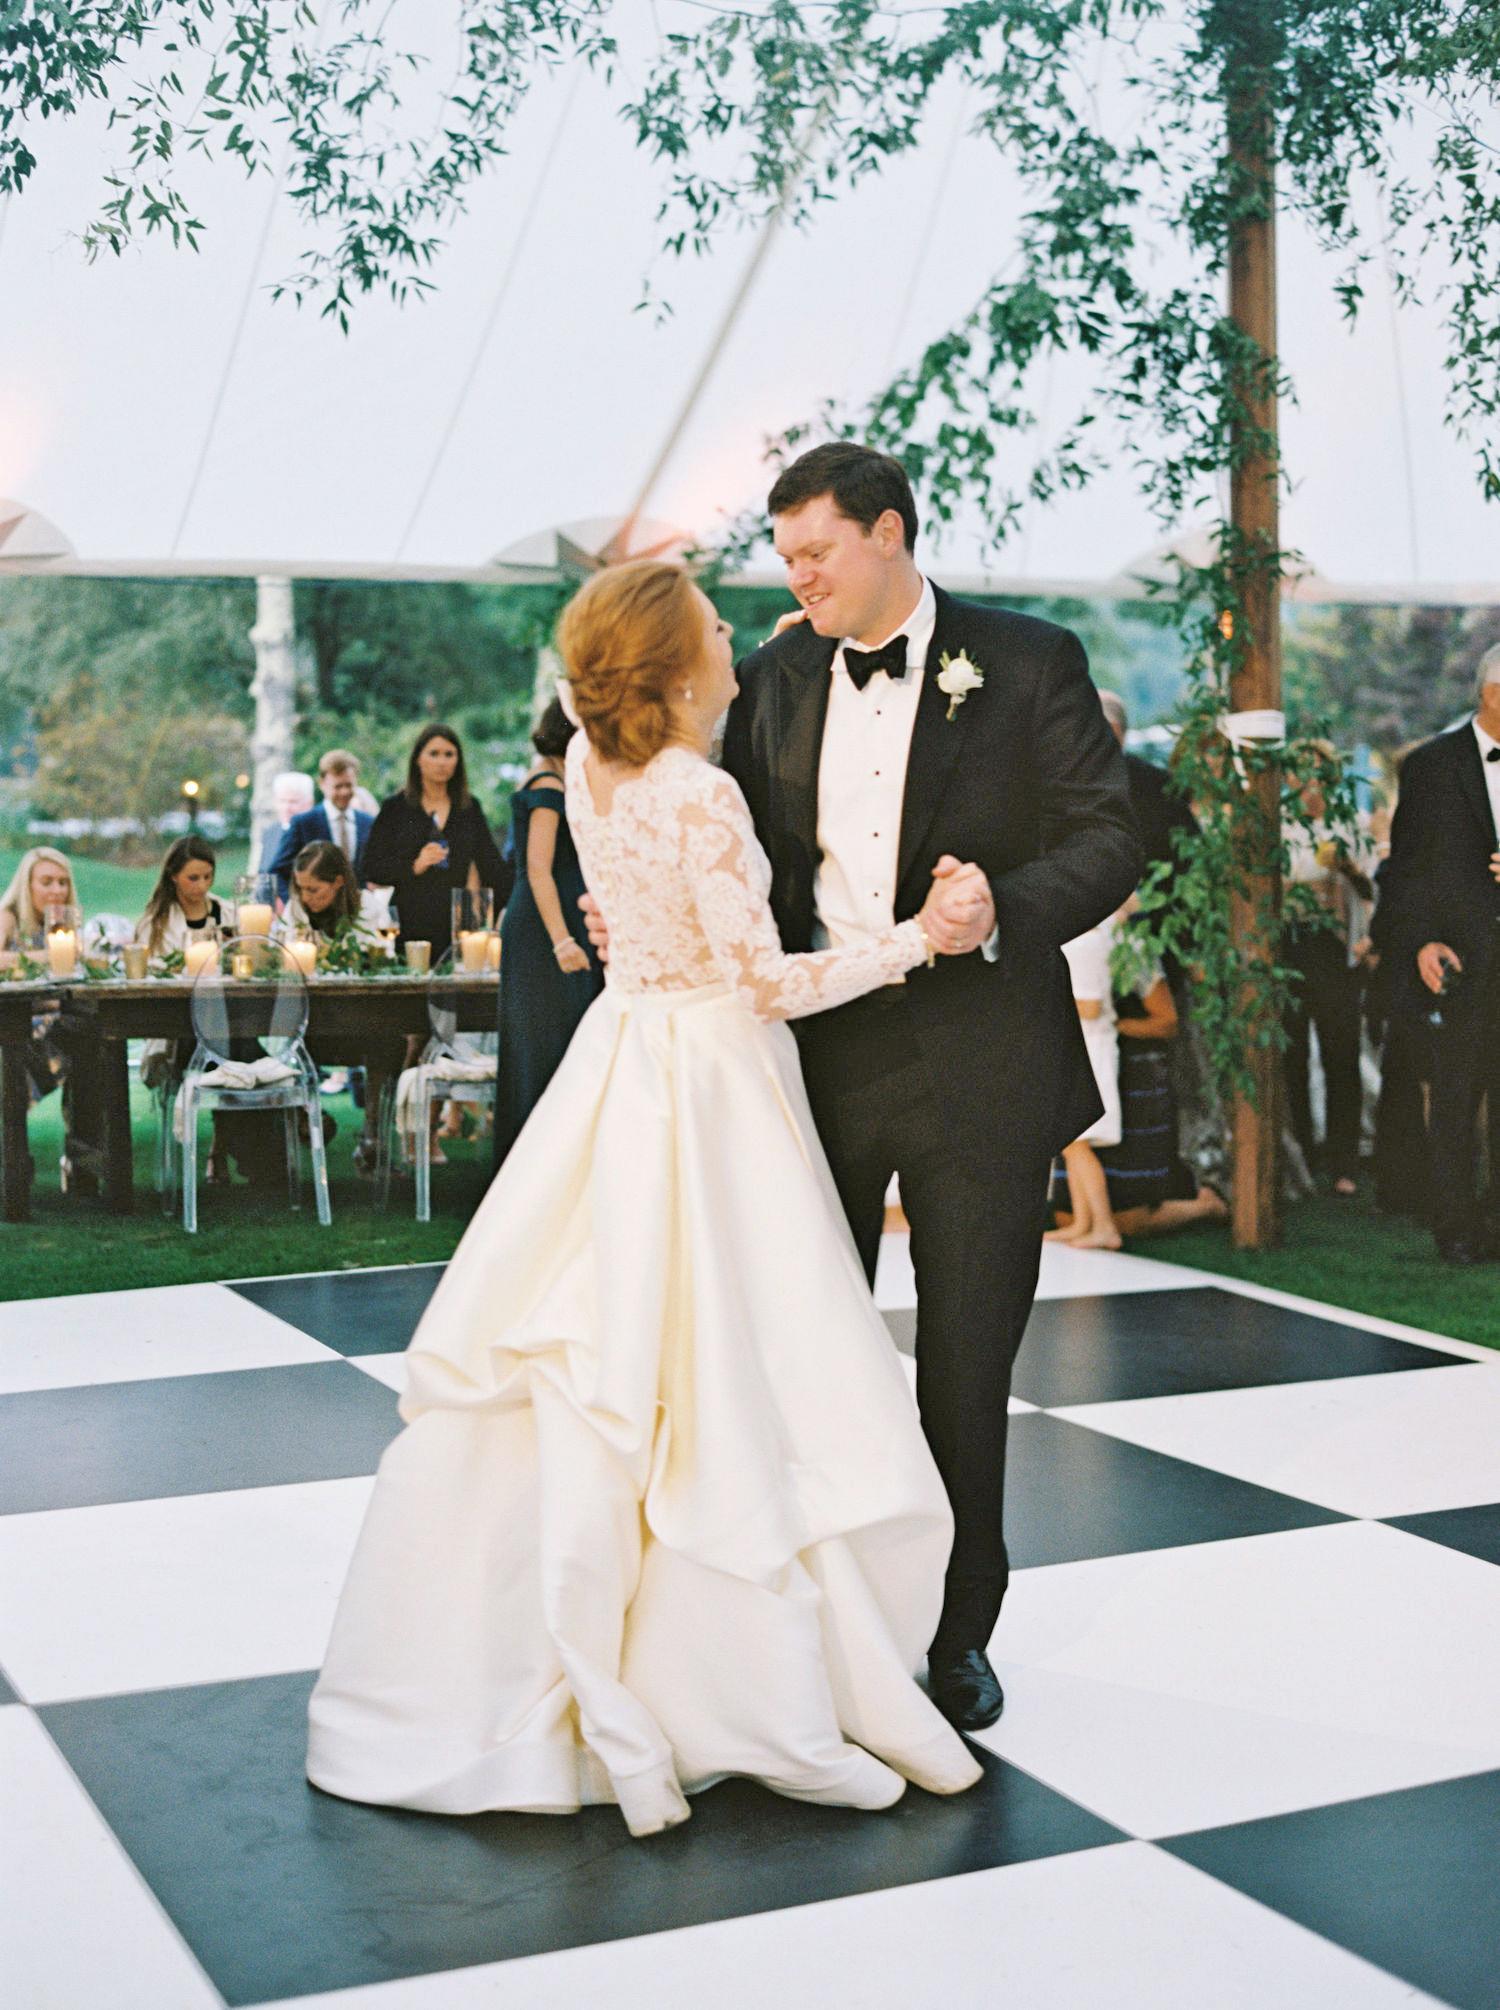 kathleen henry wedding first dance